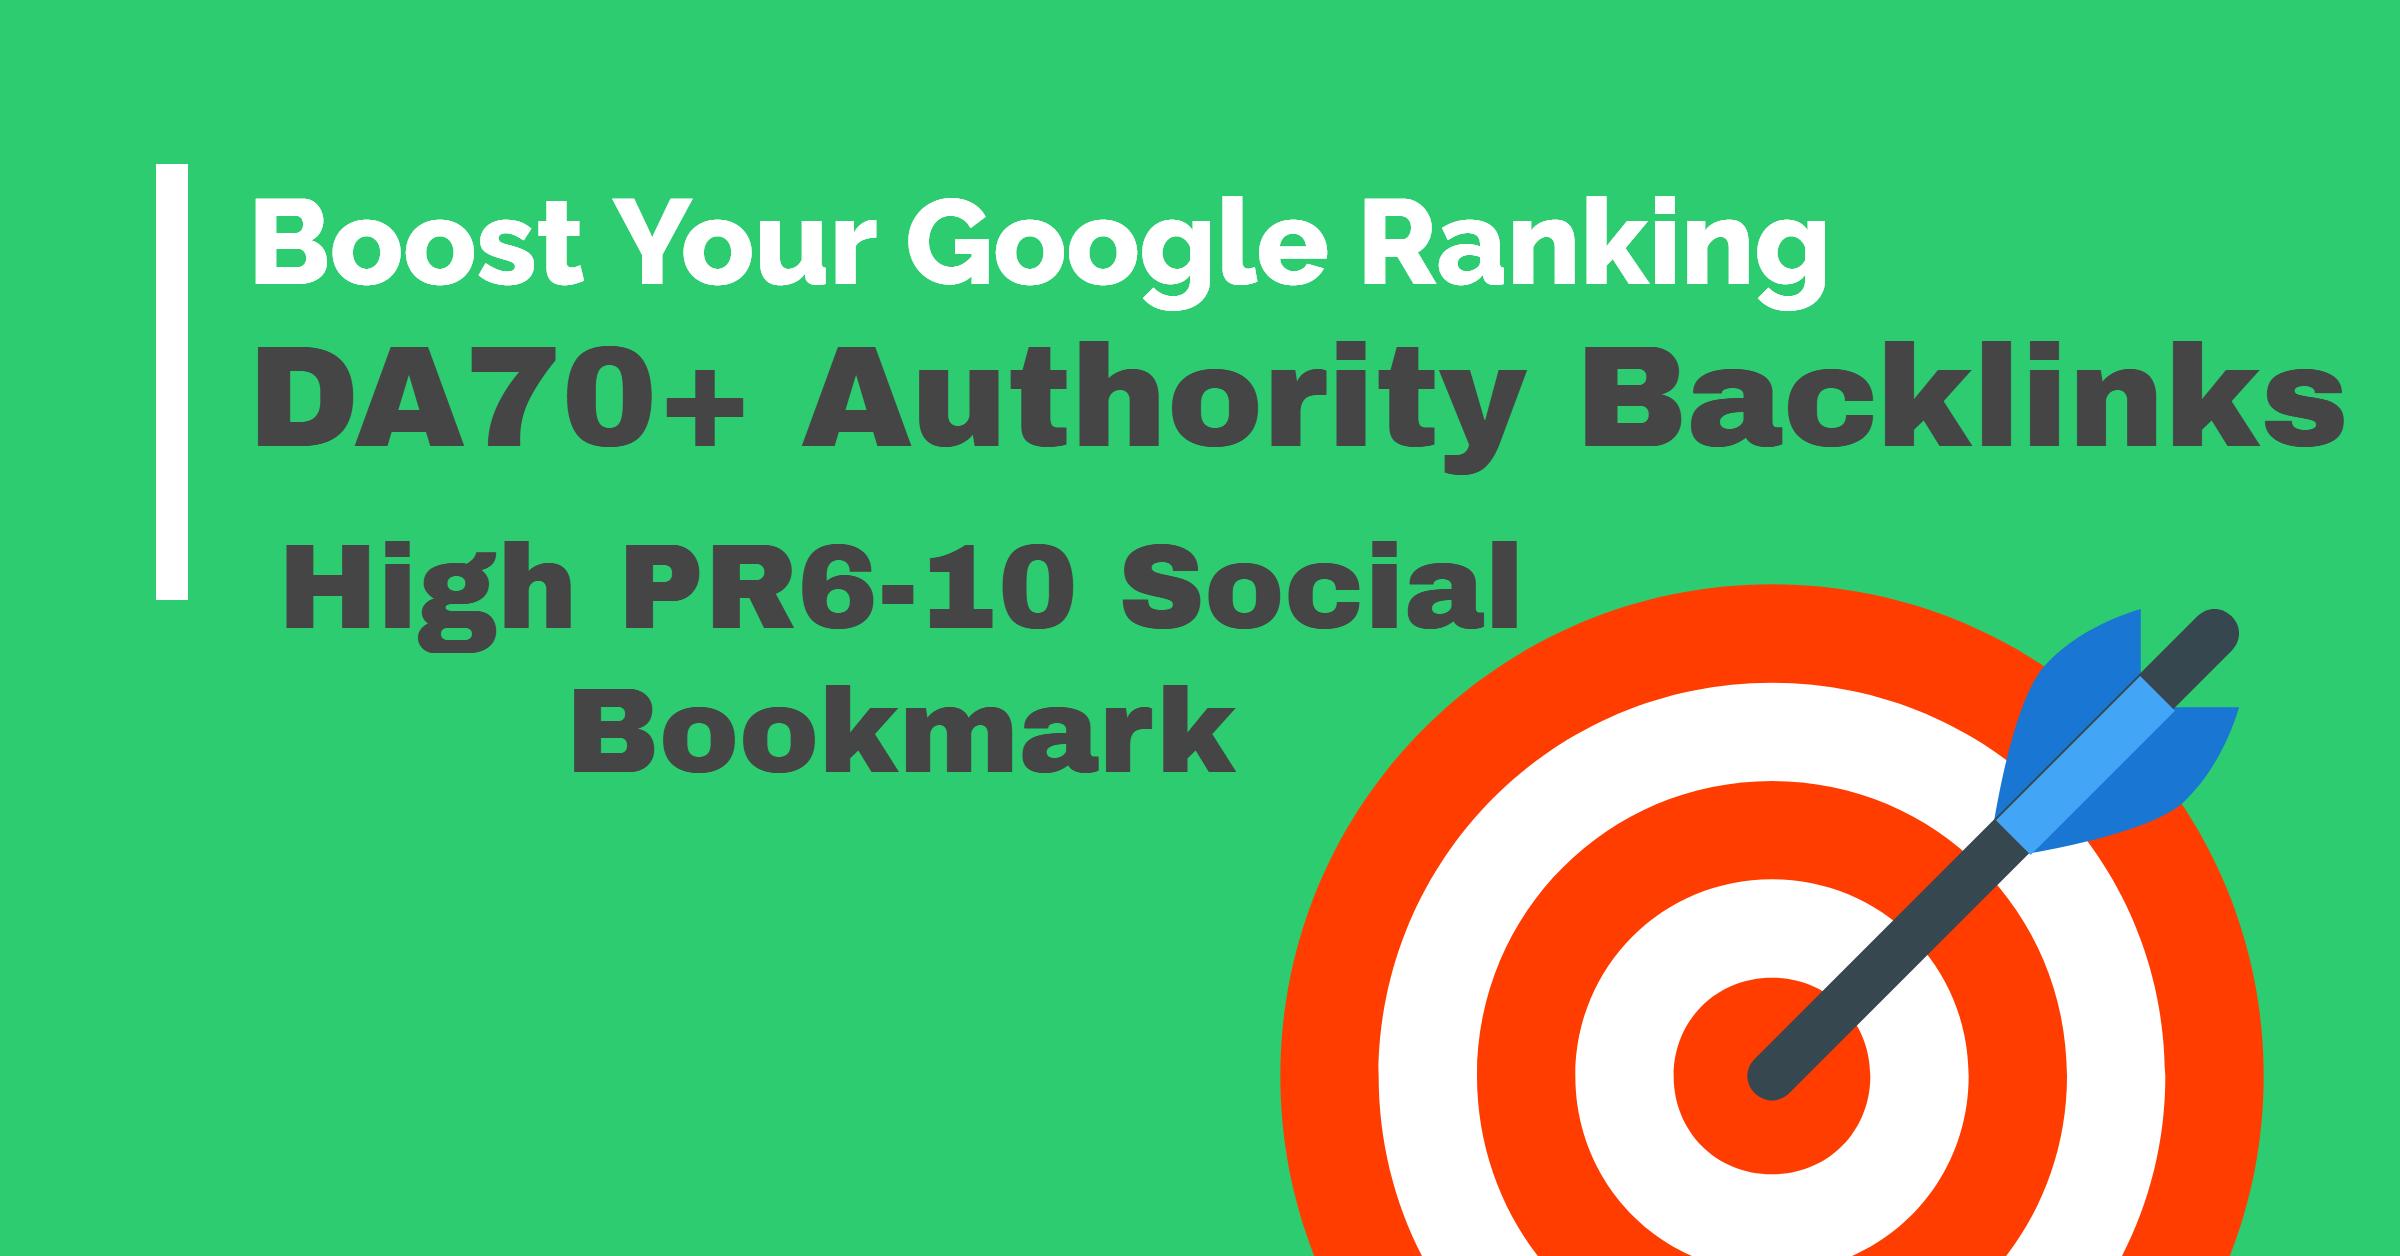 low spam score DA80+ 30 dofollow backlinks + 10 Social Bookmark